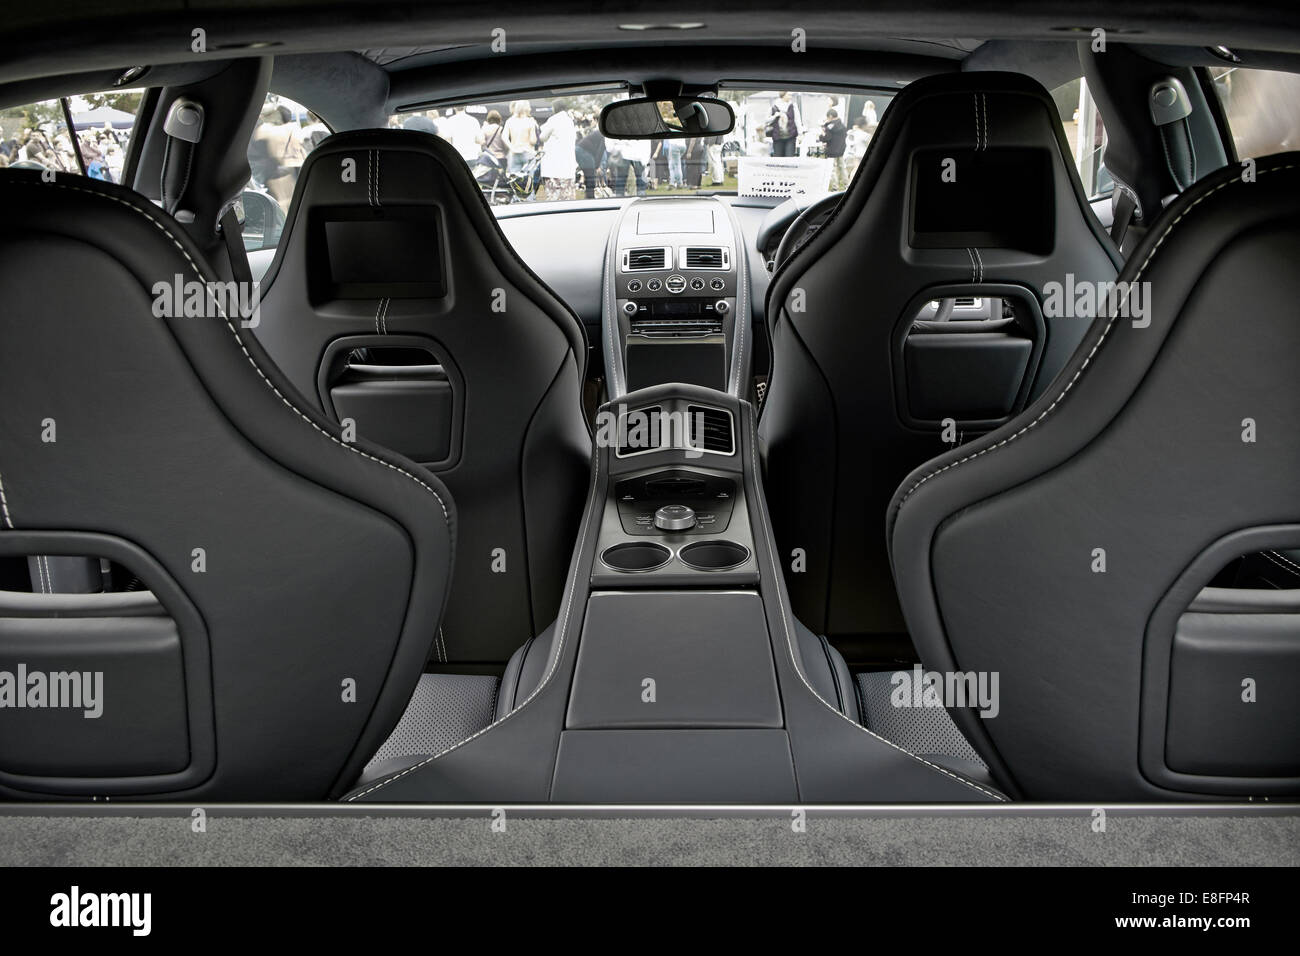 Aston Martin Rapide S Rear Interior View Of The 2014 Aston Martin Stock Photo Alamy